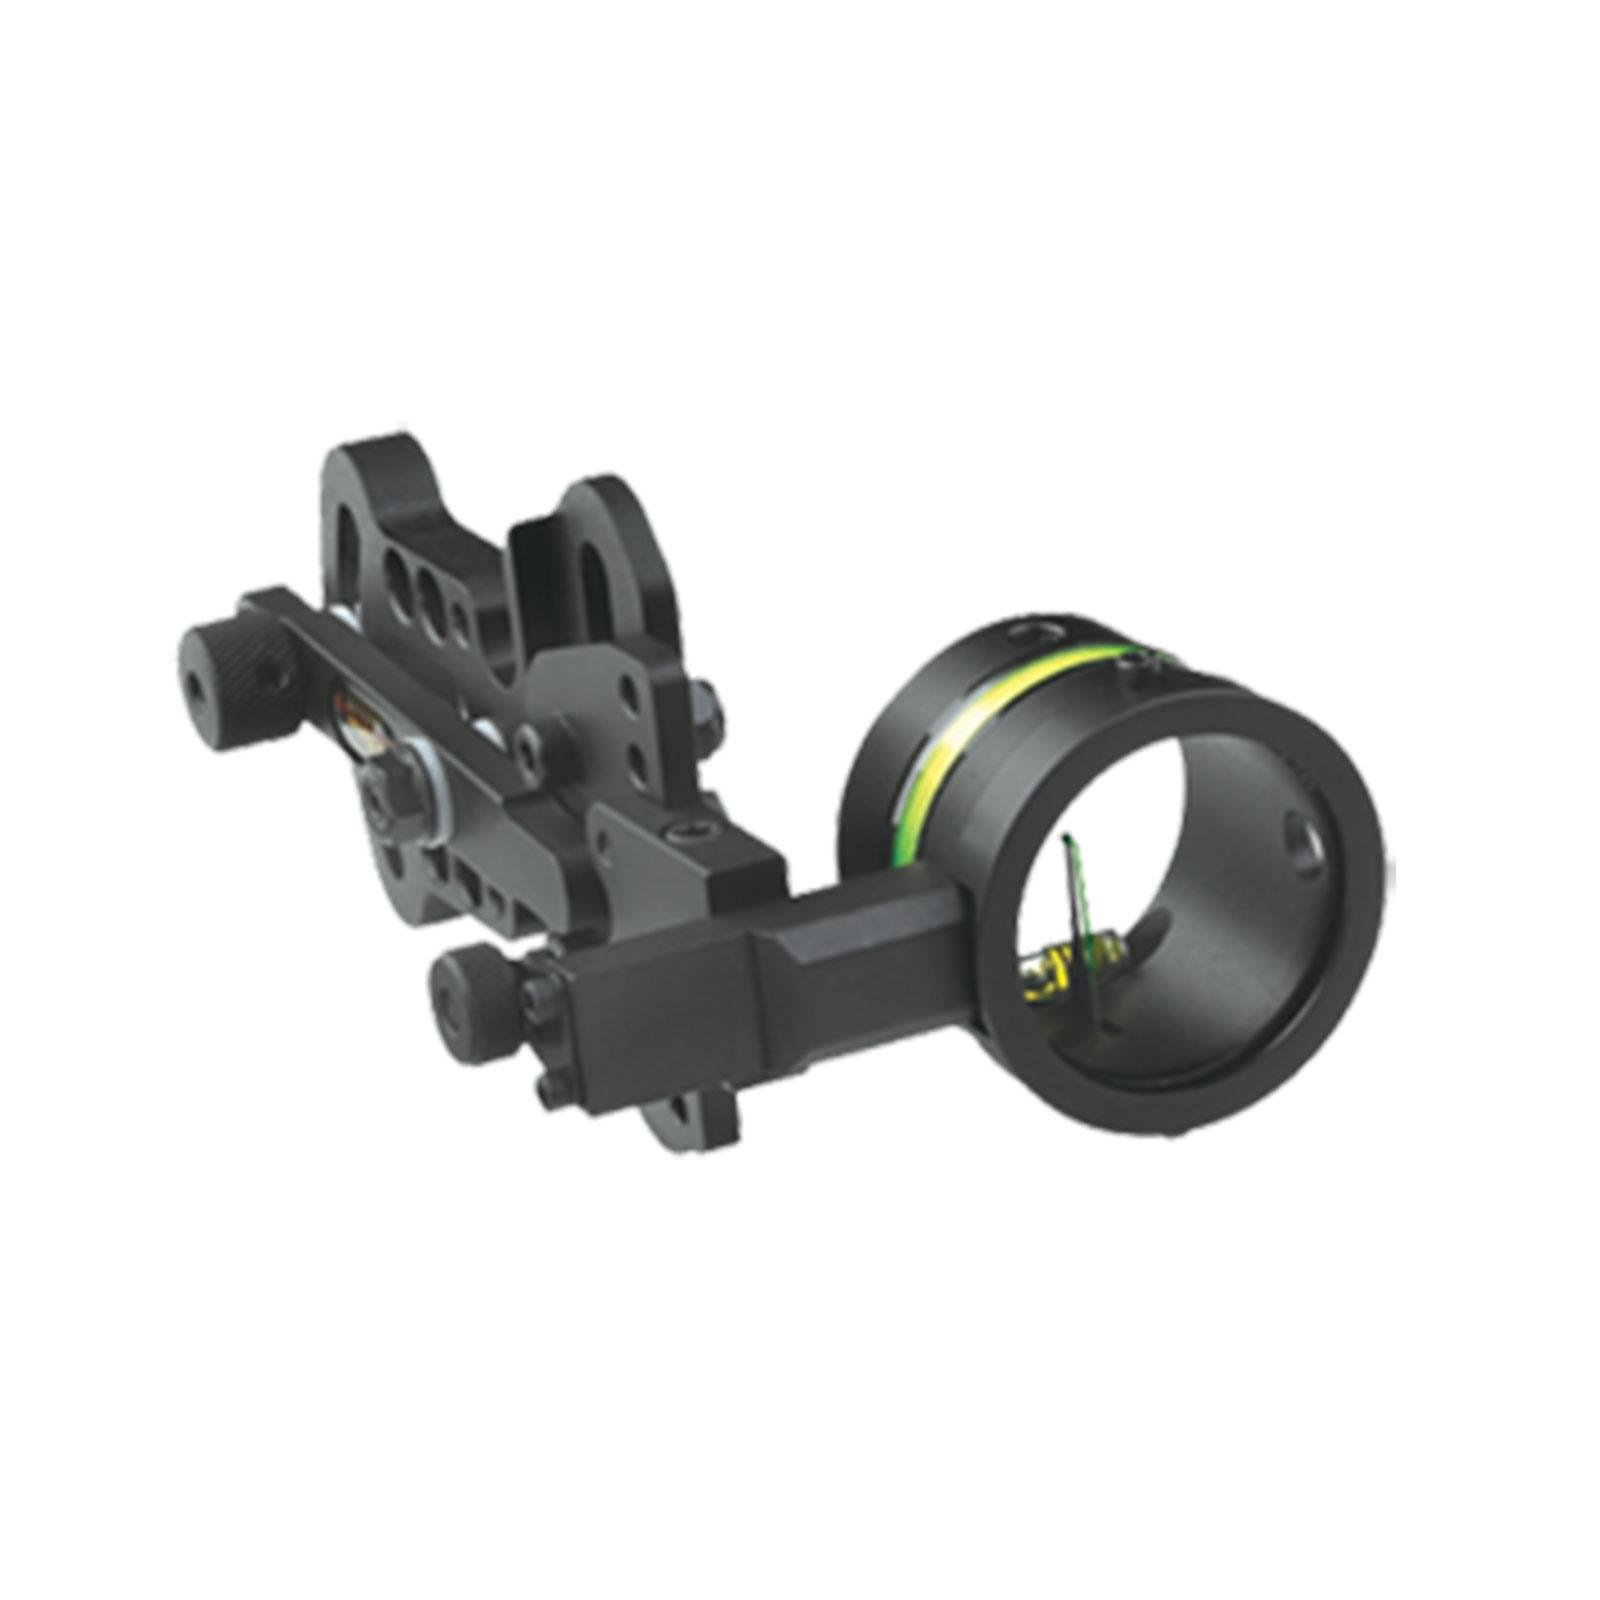 HHA OL-5000 Optimizer Lite 5000 .029 Sight (Black)